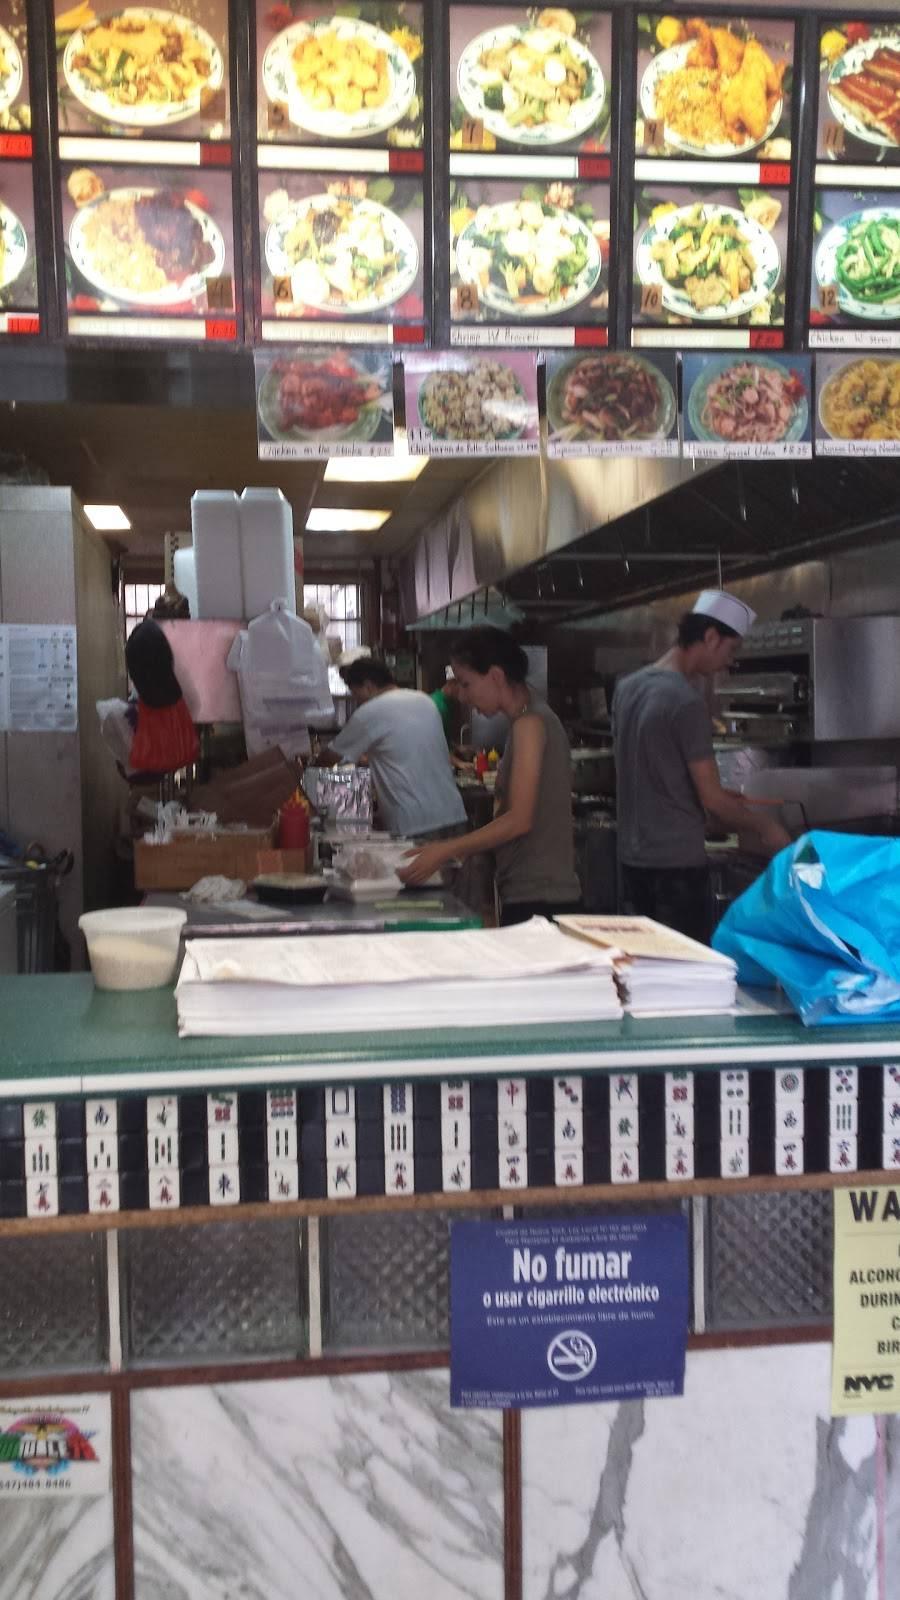 New Oriental House | restaurant | 565 E 184th St, Bronx, NY 10458, USA | 7185638888 OR +1 718-563-8888